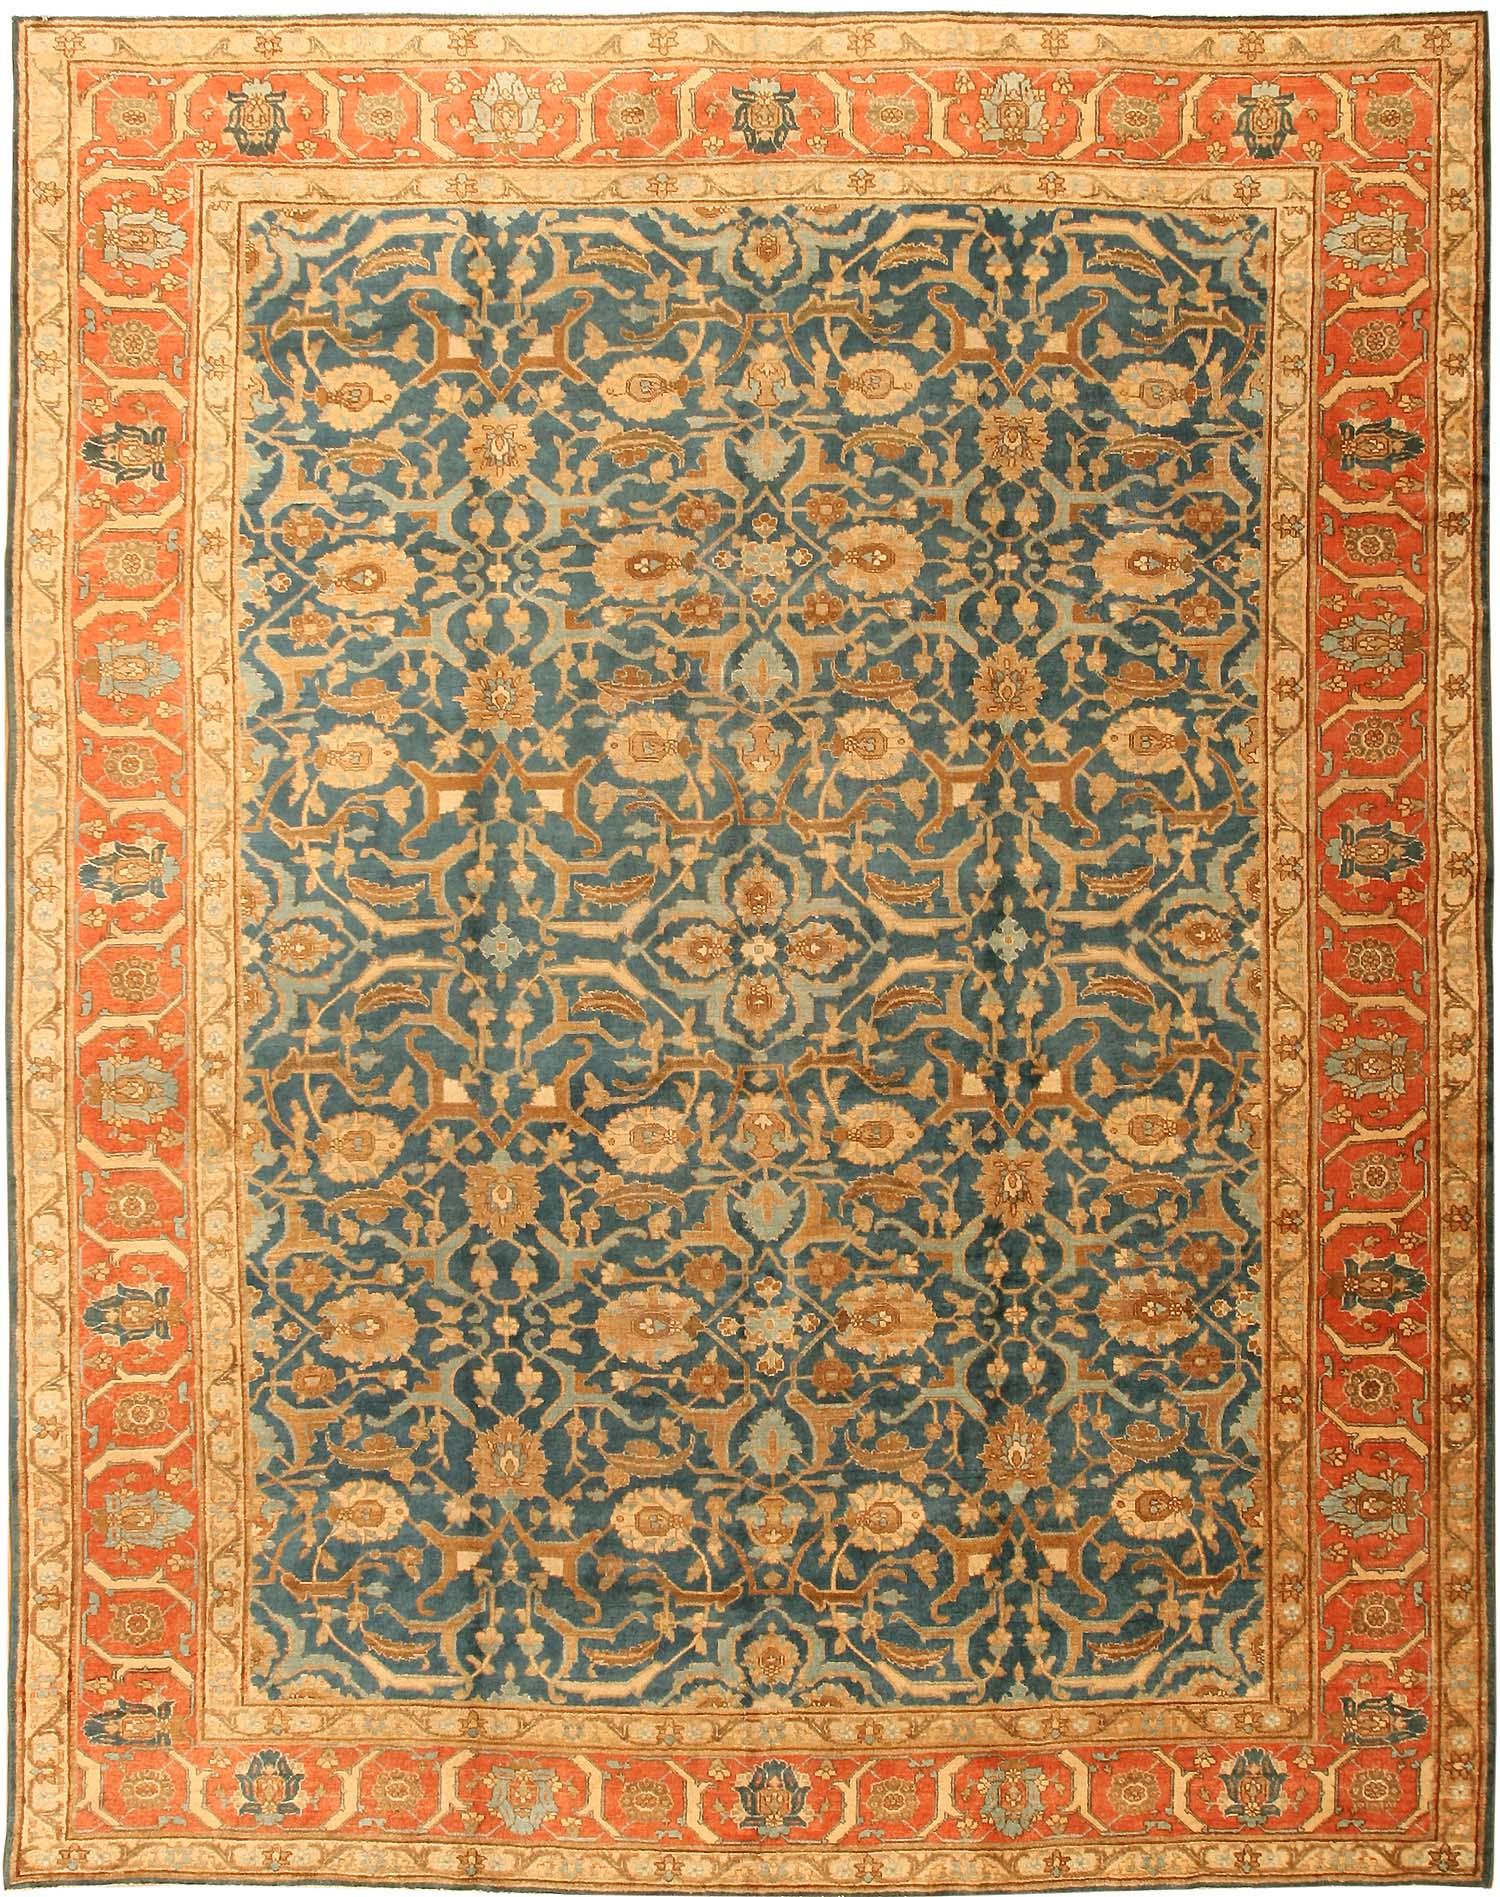 Antique Tabriz Persian Rug 41622 Antique Tabriz Persian Rugs 416222 1500x1897